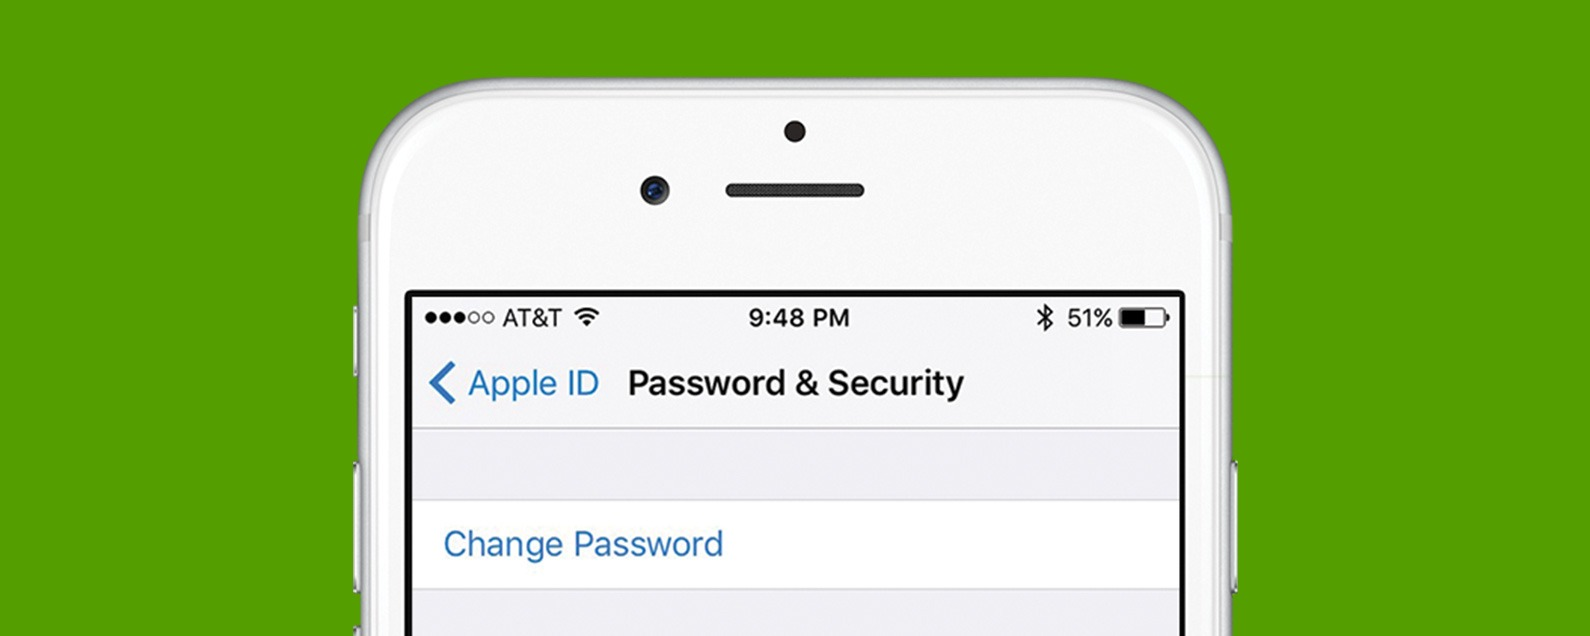 How do i change my apple id password on my iphone 6s